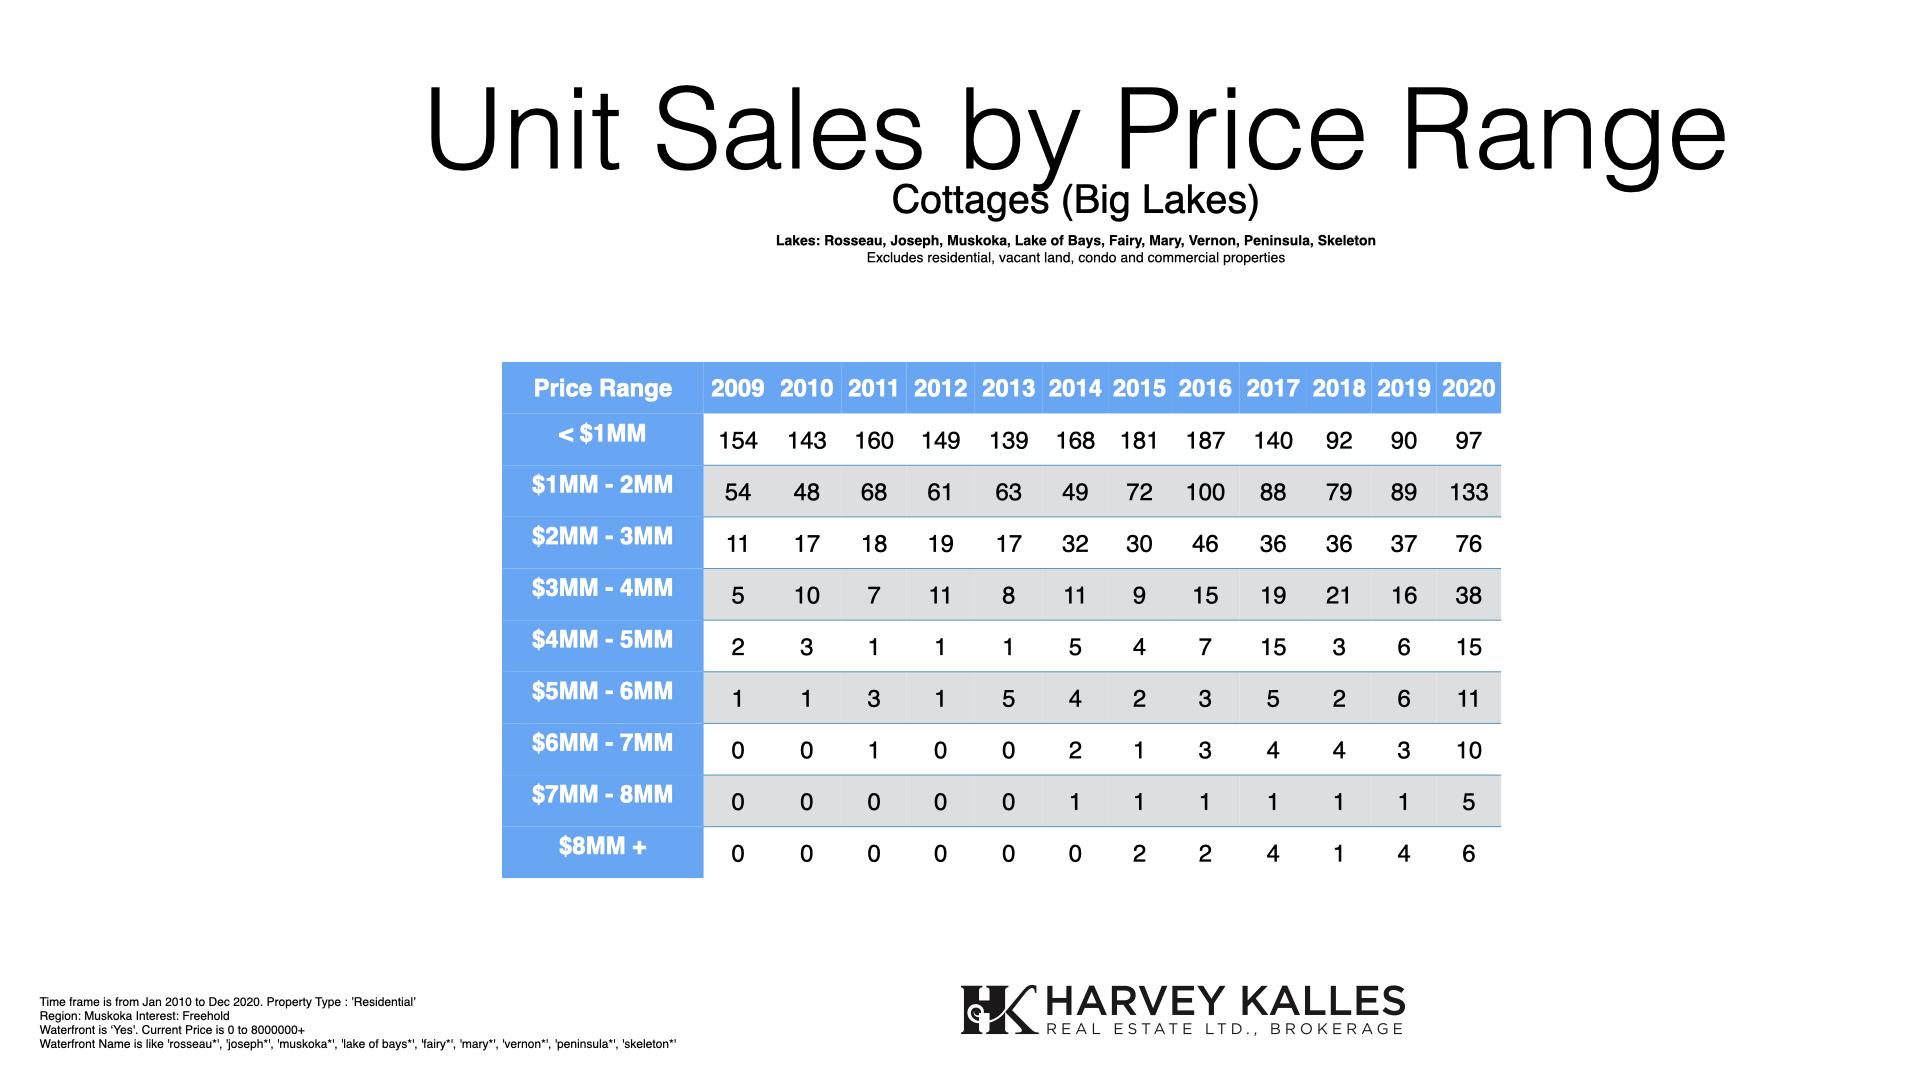 muskoka-big-lakes-cottage-real-estate-sales-by-price-range